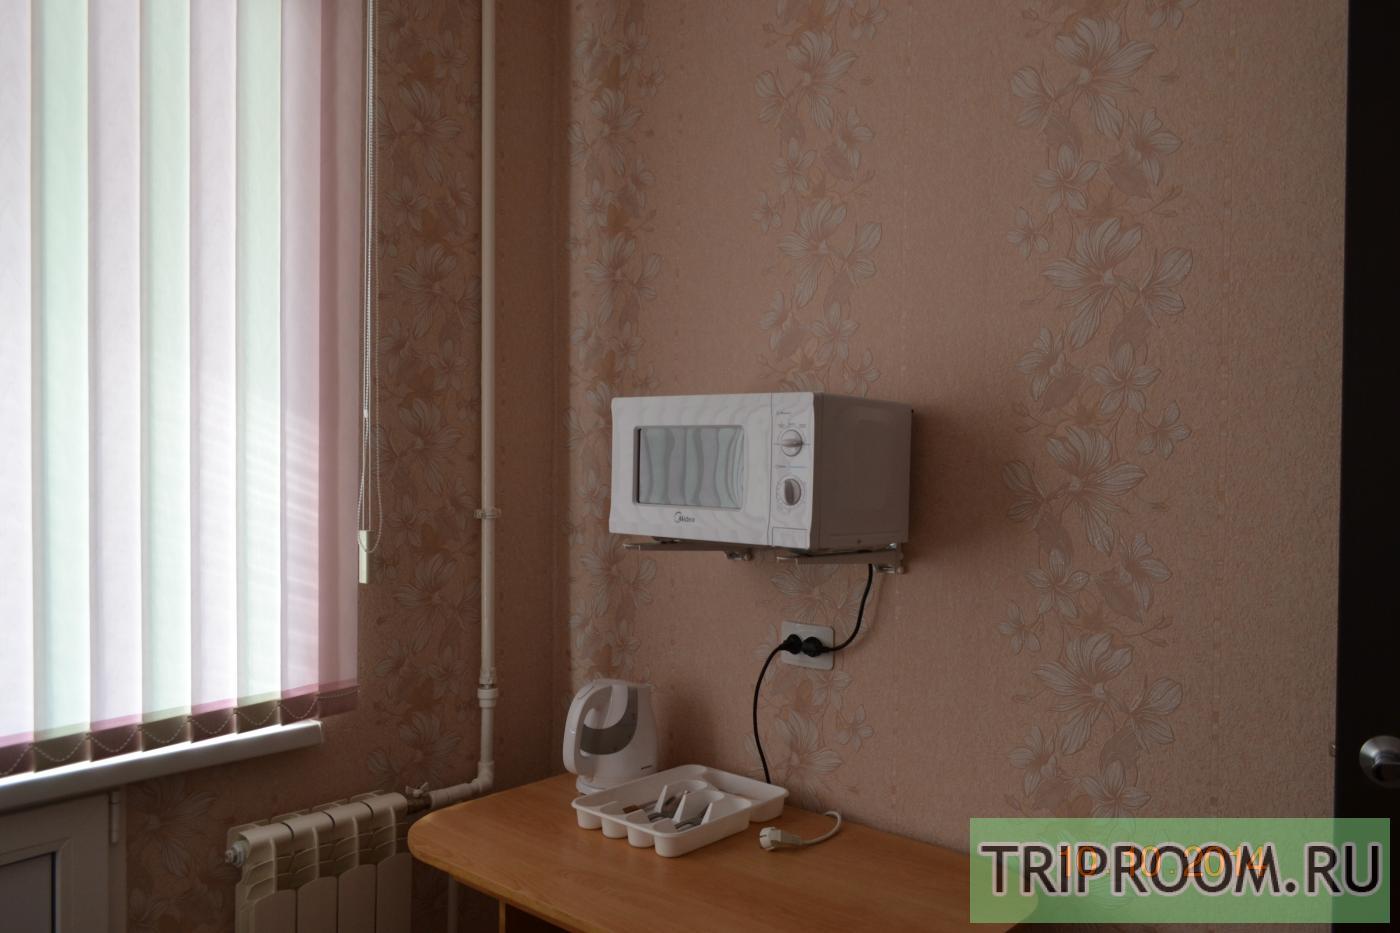 1-комнатная квартира посуточно (вариант № 7477), ул. Фадеева улица, фото № 5